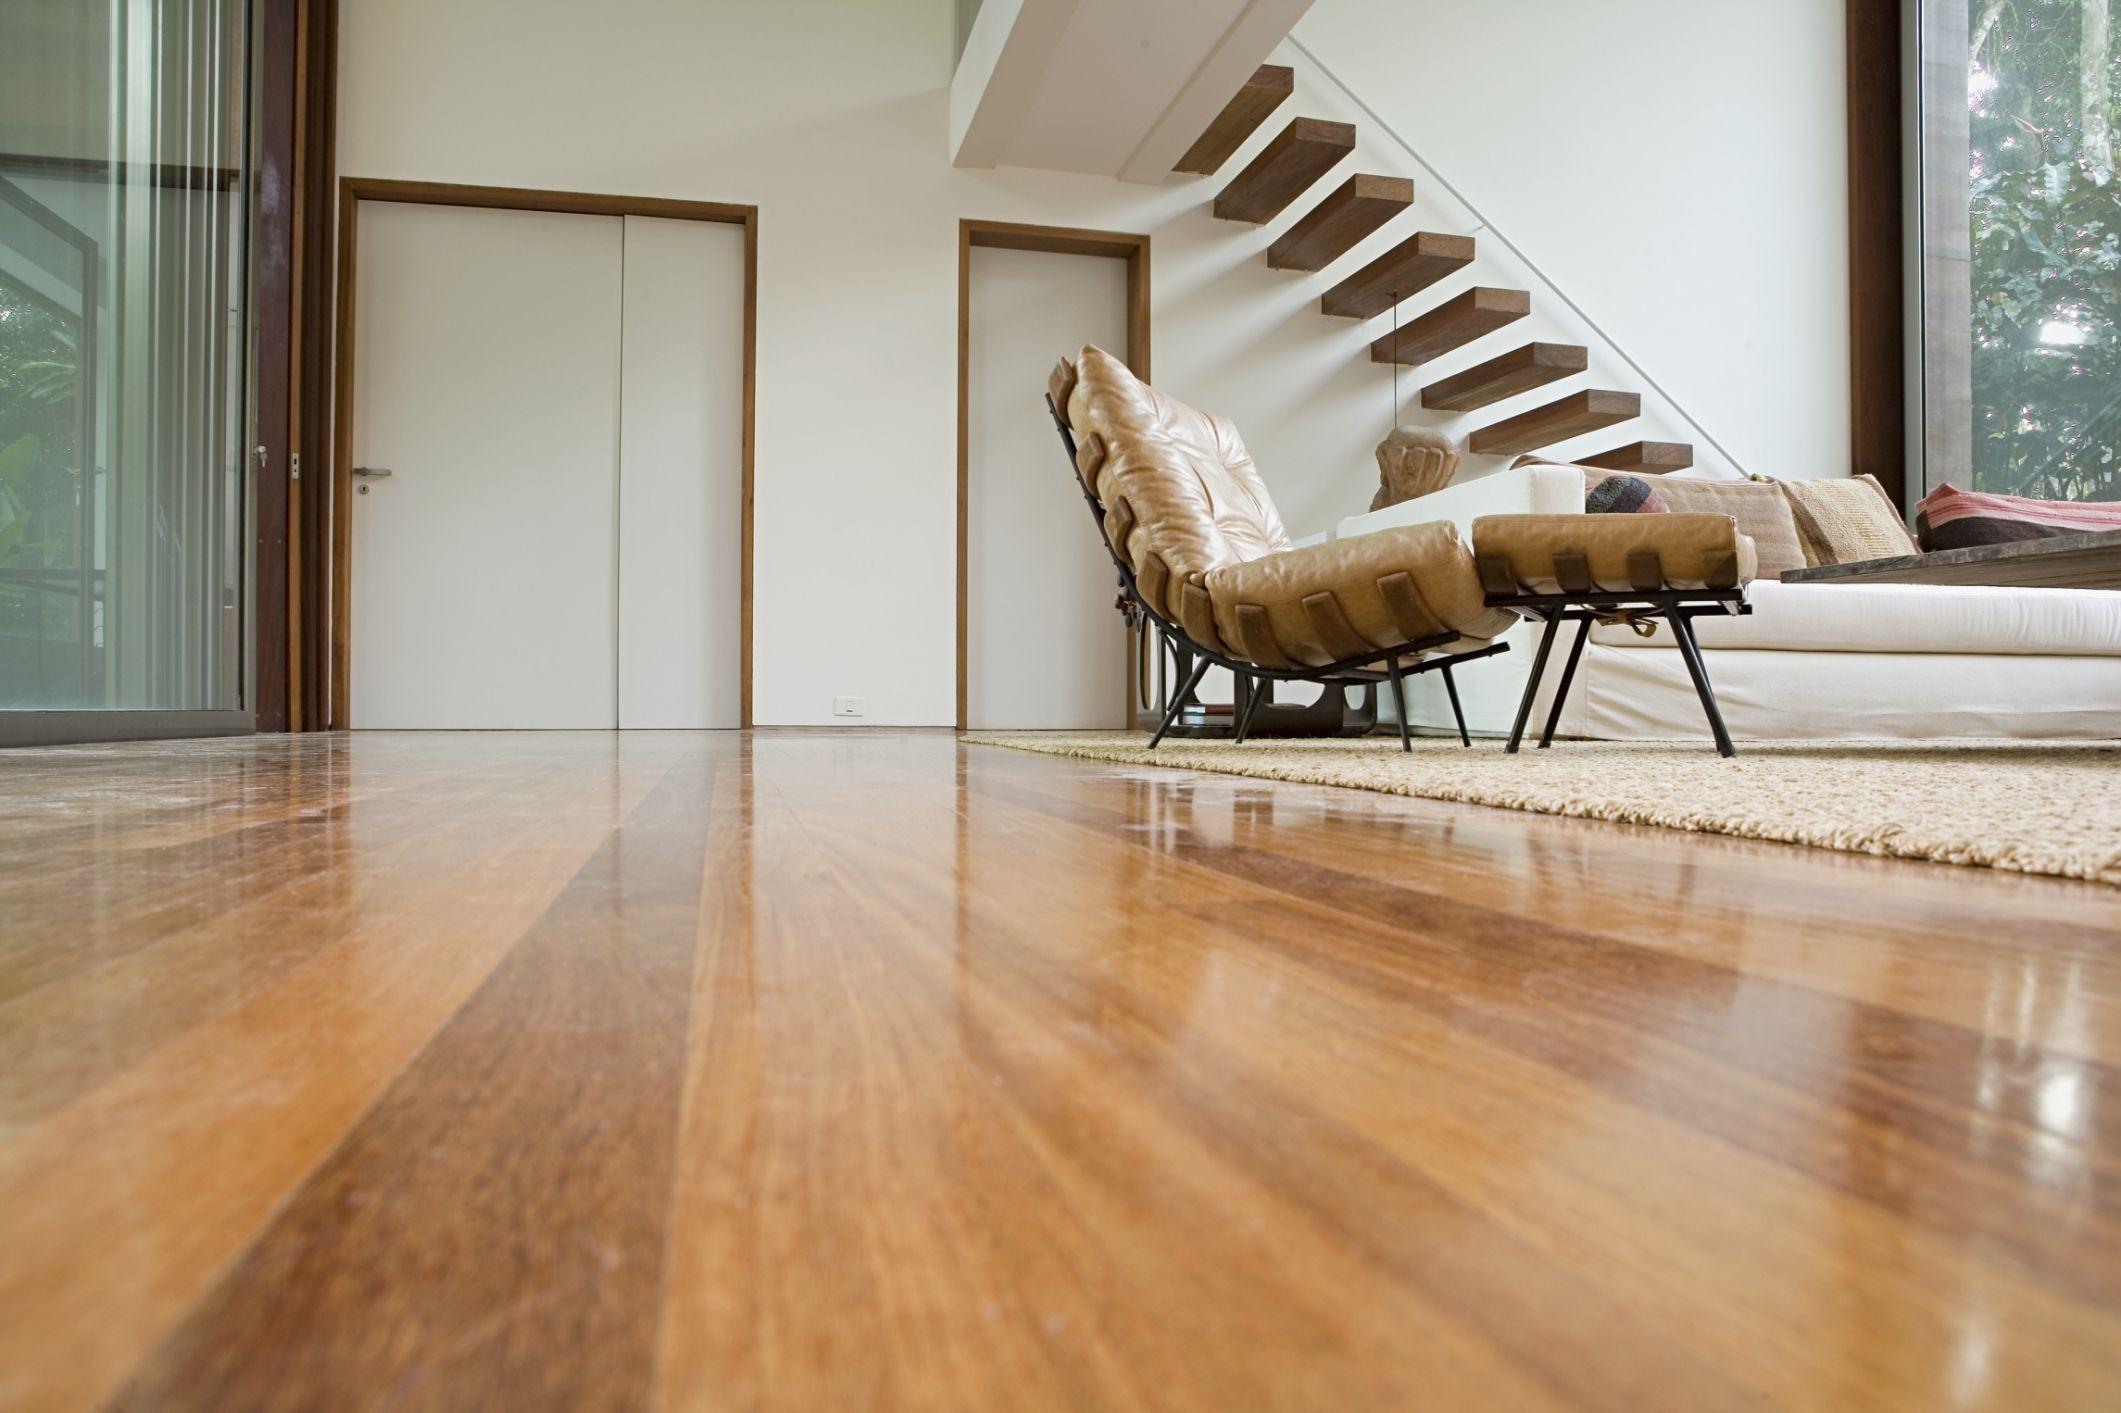 top quality hardwood flooring of engineered wood flooring vs solid wood flooring intended for 200571260 001 highres 56a49dec5f9b58b7d0d7dc1e